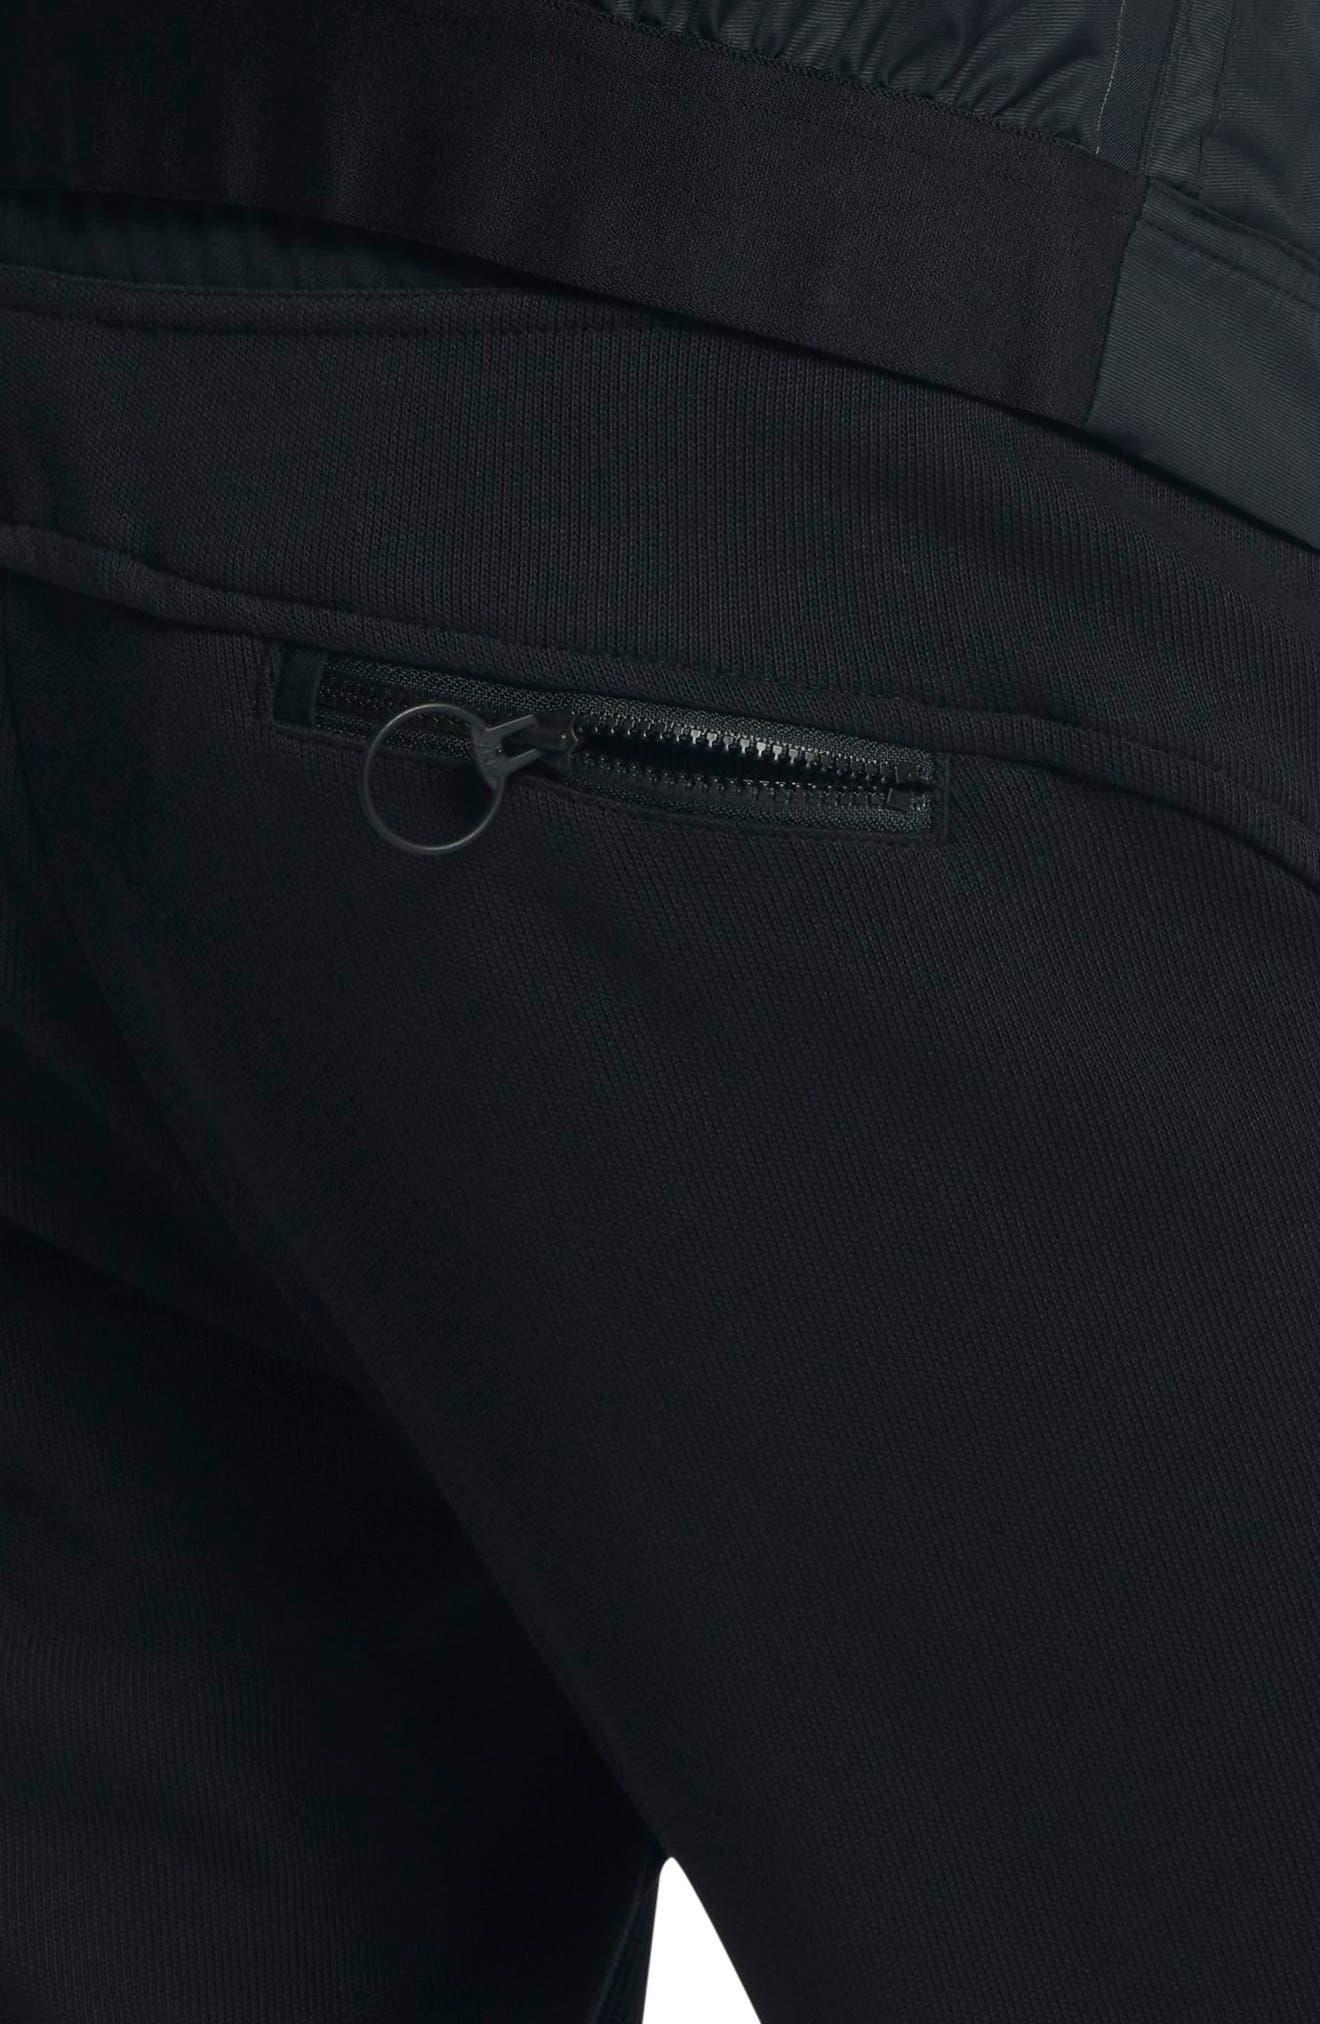 Women's Court Tennis Pants,                             Alternate thumbnail 5, color,                             Black/ Hot Punch/ White